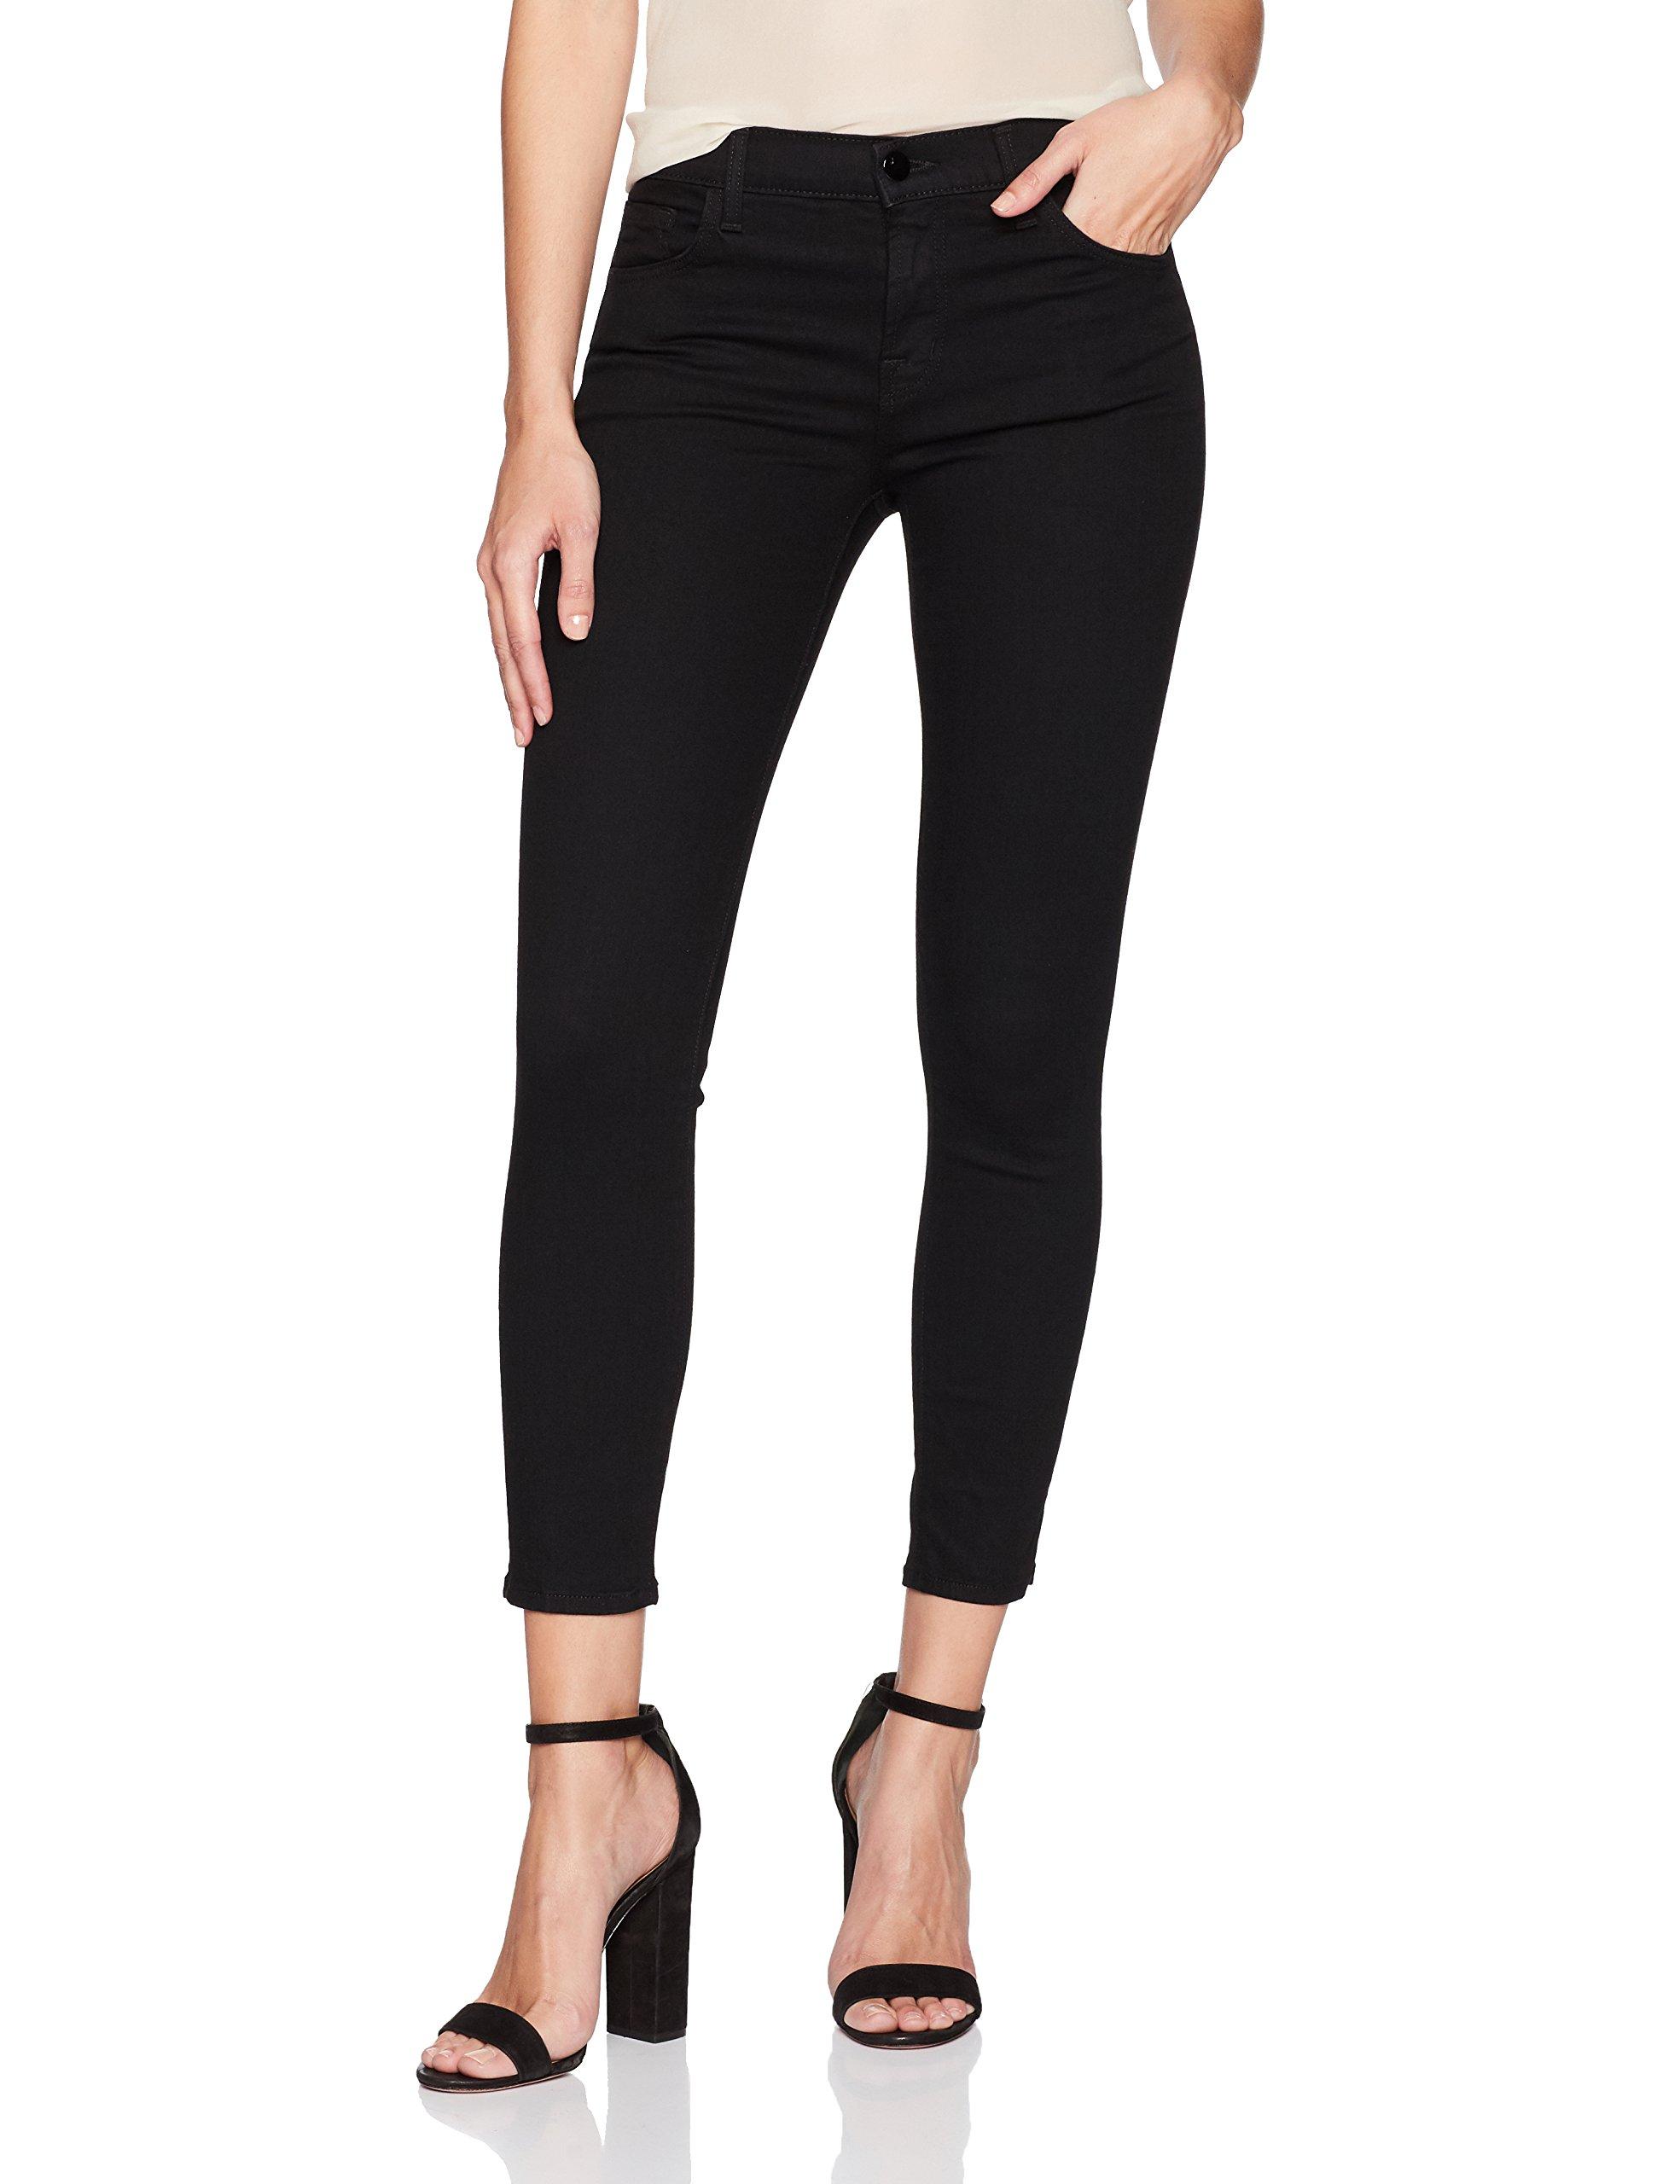 J Brand Jeans Women's 835 Mid Rise Capri, Vanity, 26